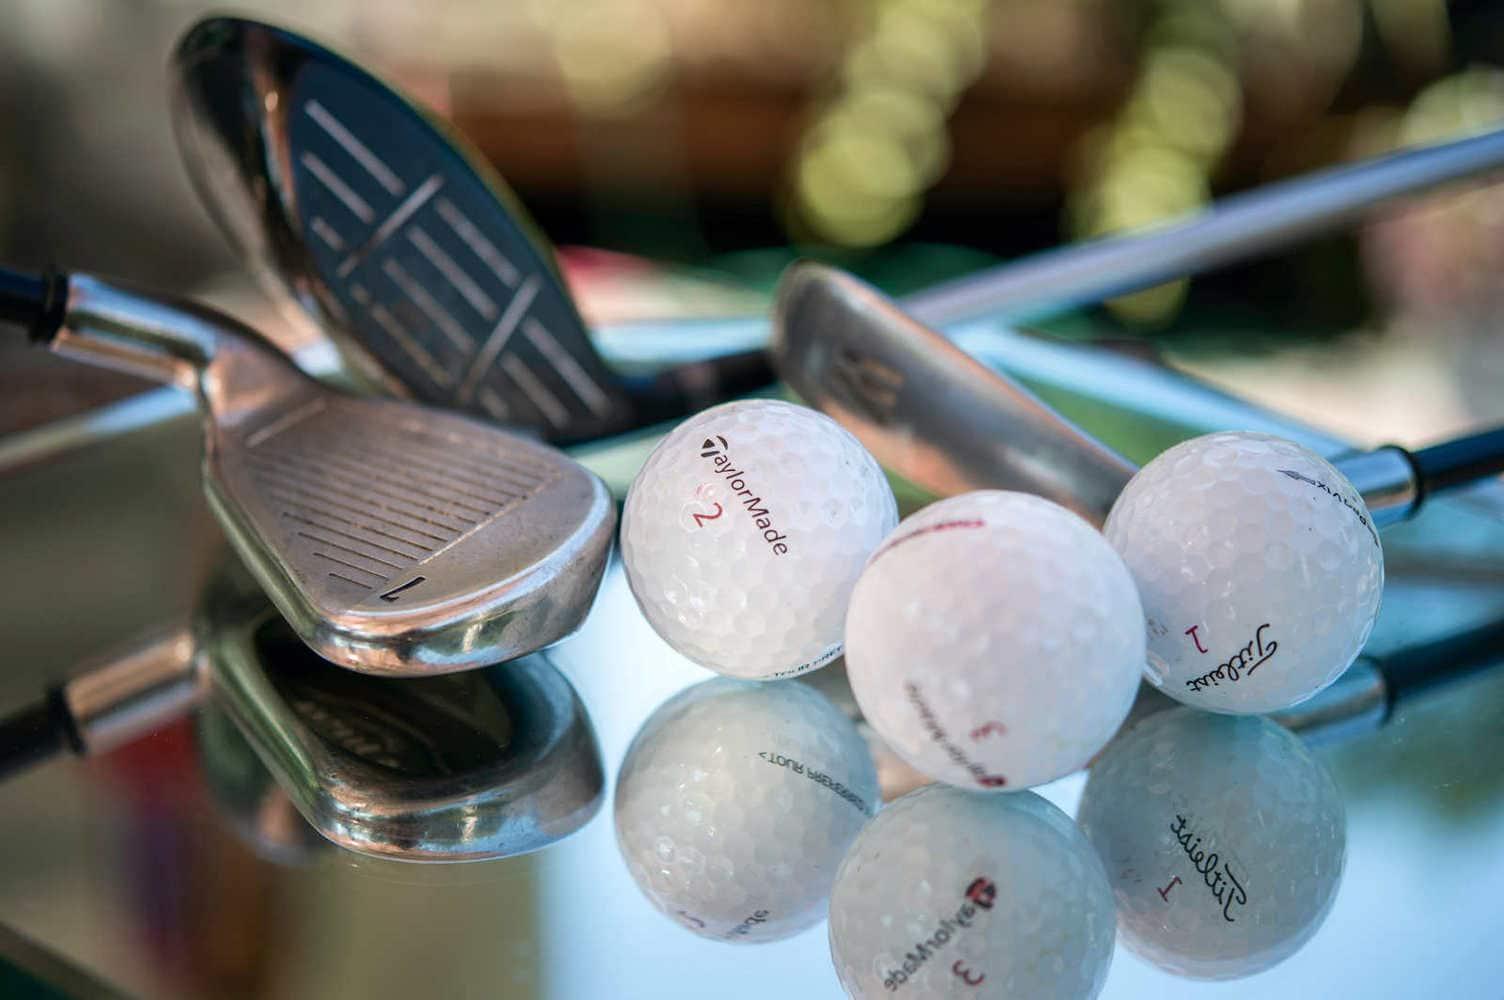 The Western Australian Golf Club of Yokine